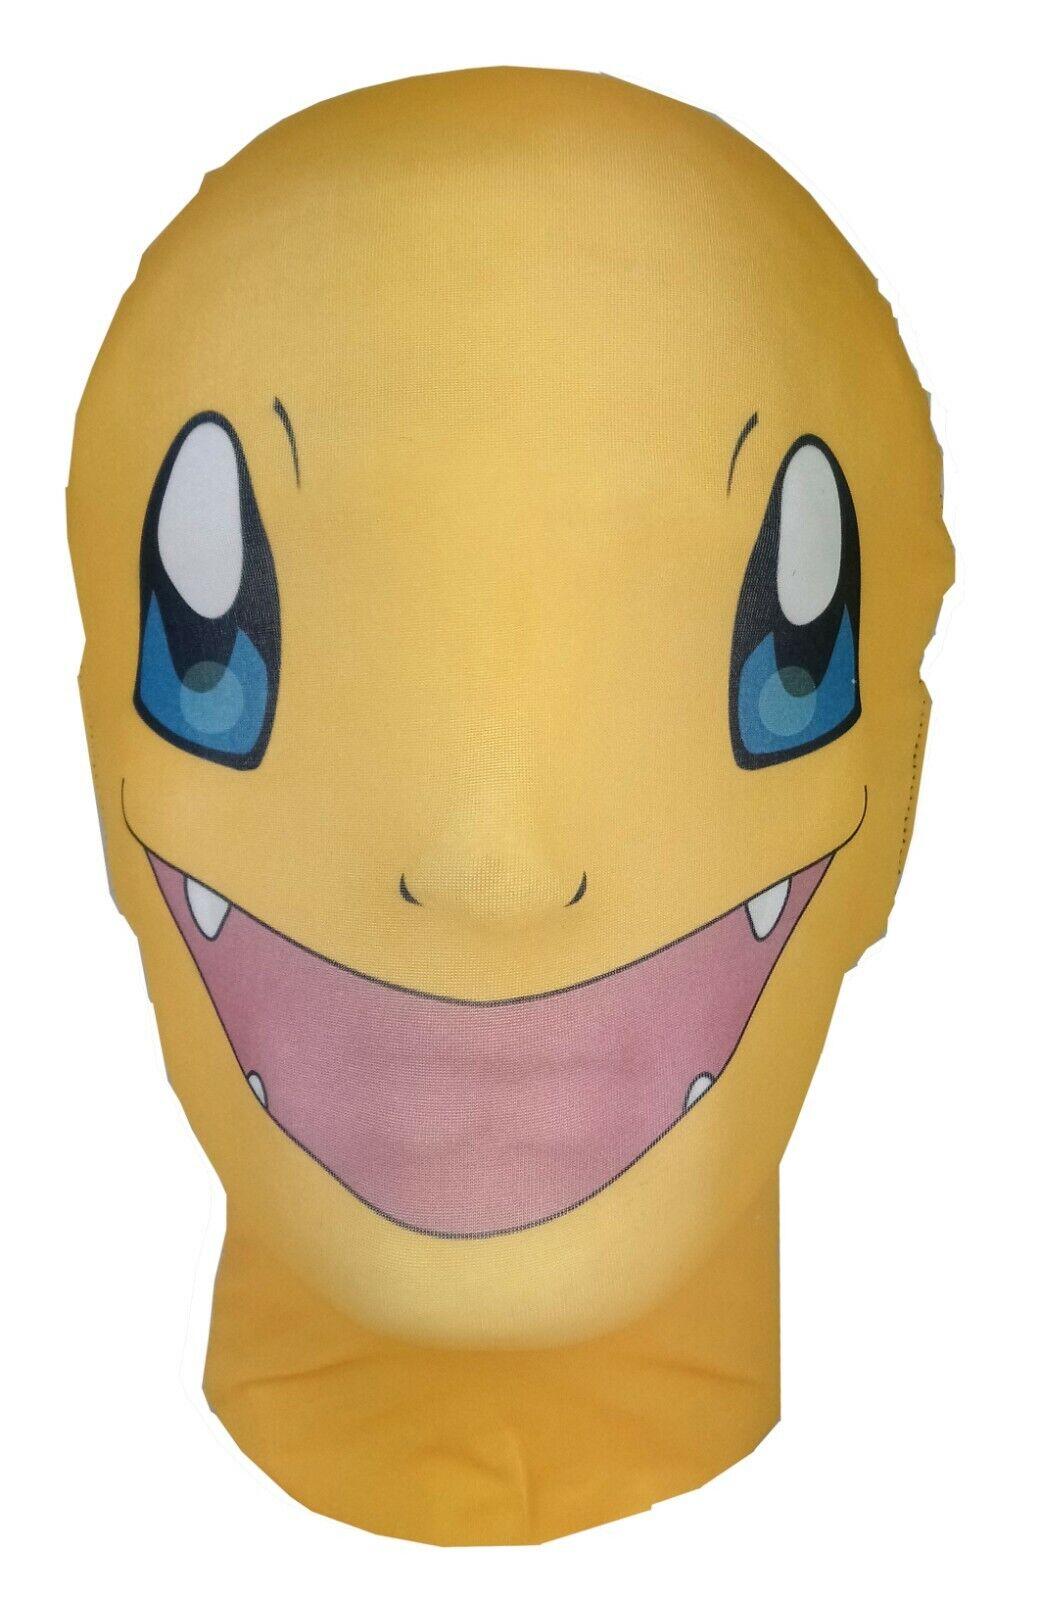 Charmander Full Head Mask, Pokemon GO Costume, Cosplay, Halloween Fancy Dress